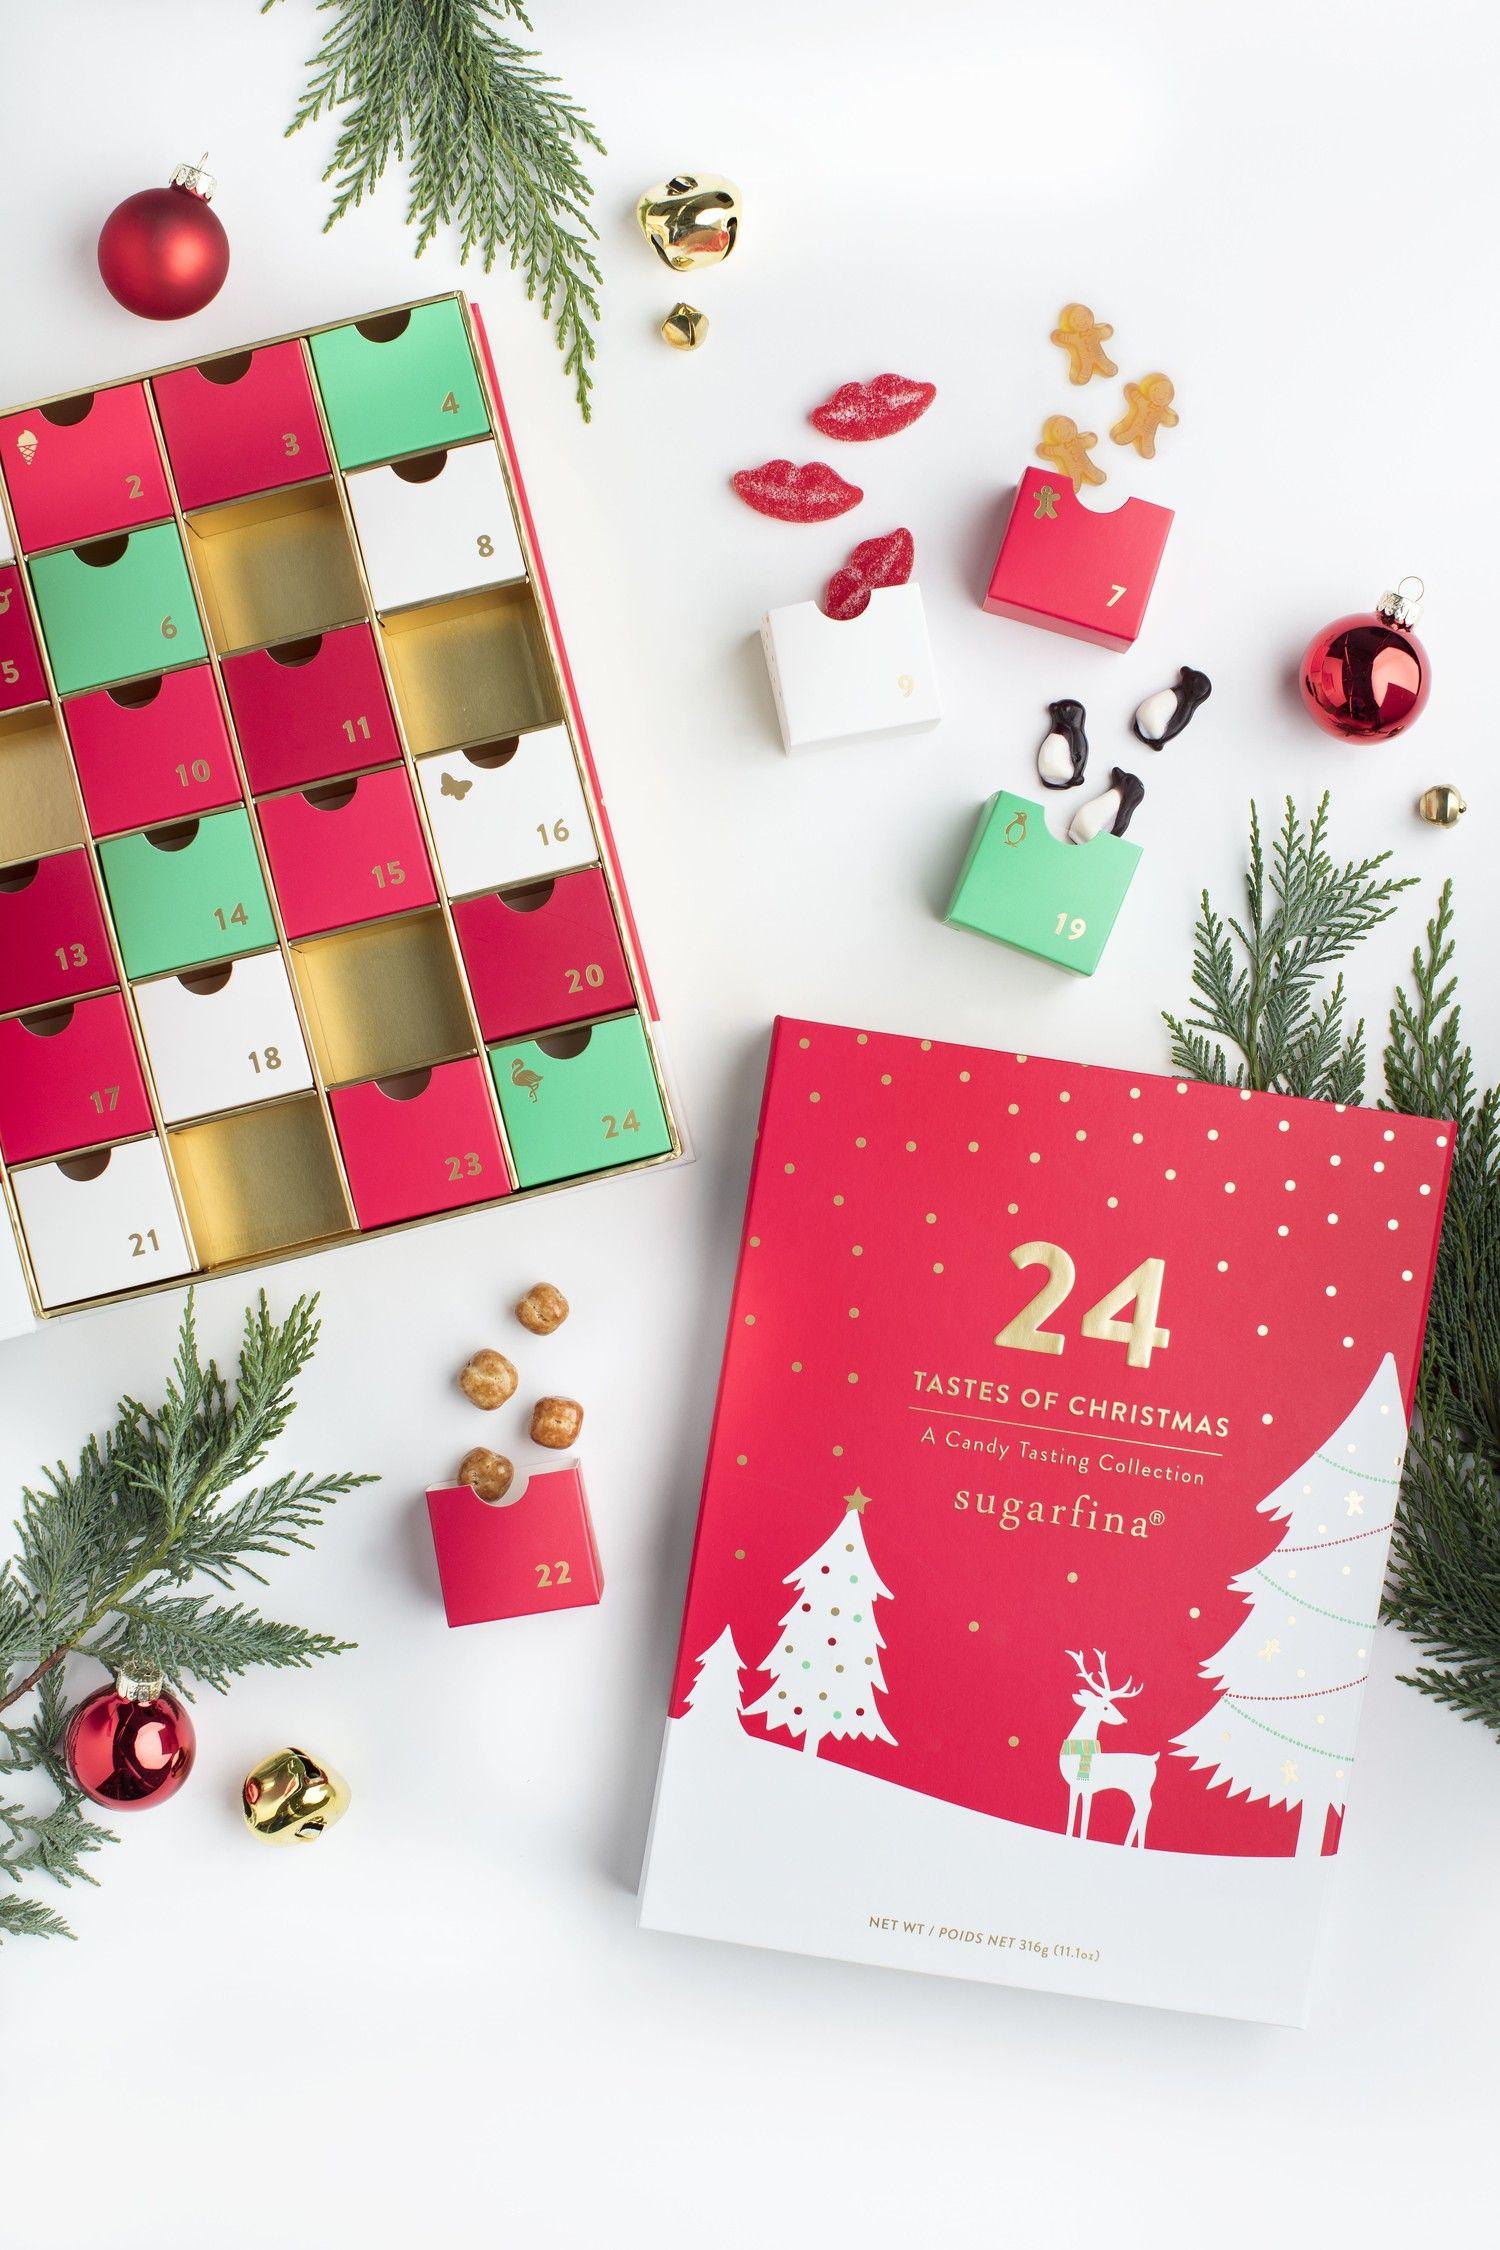 8 Amazing Advent Calendars Chocolate Wine And More Christmas Advent Calendar Homemade Advent Calendars Advent Calendars For Kids